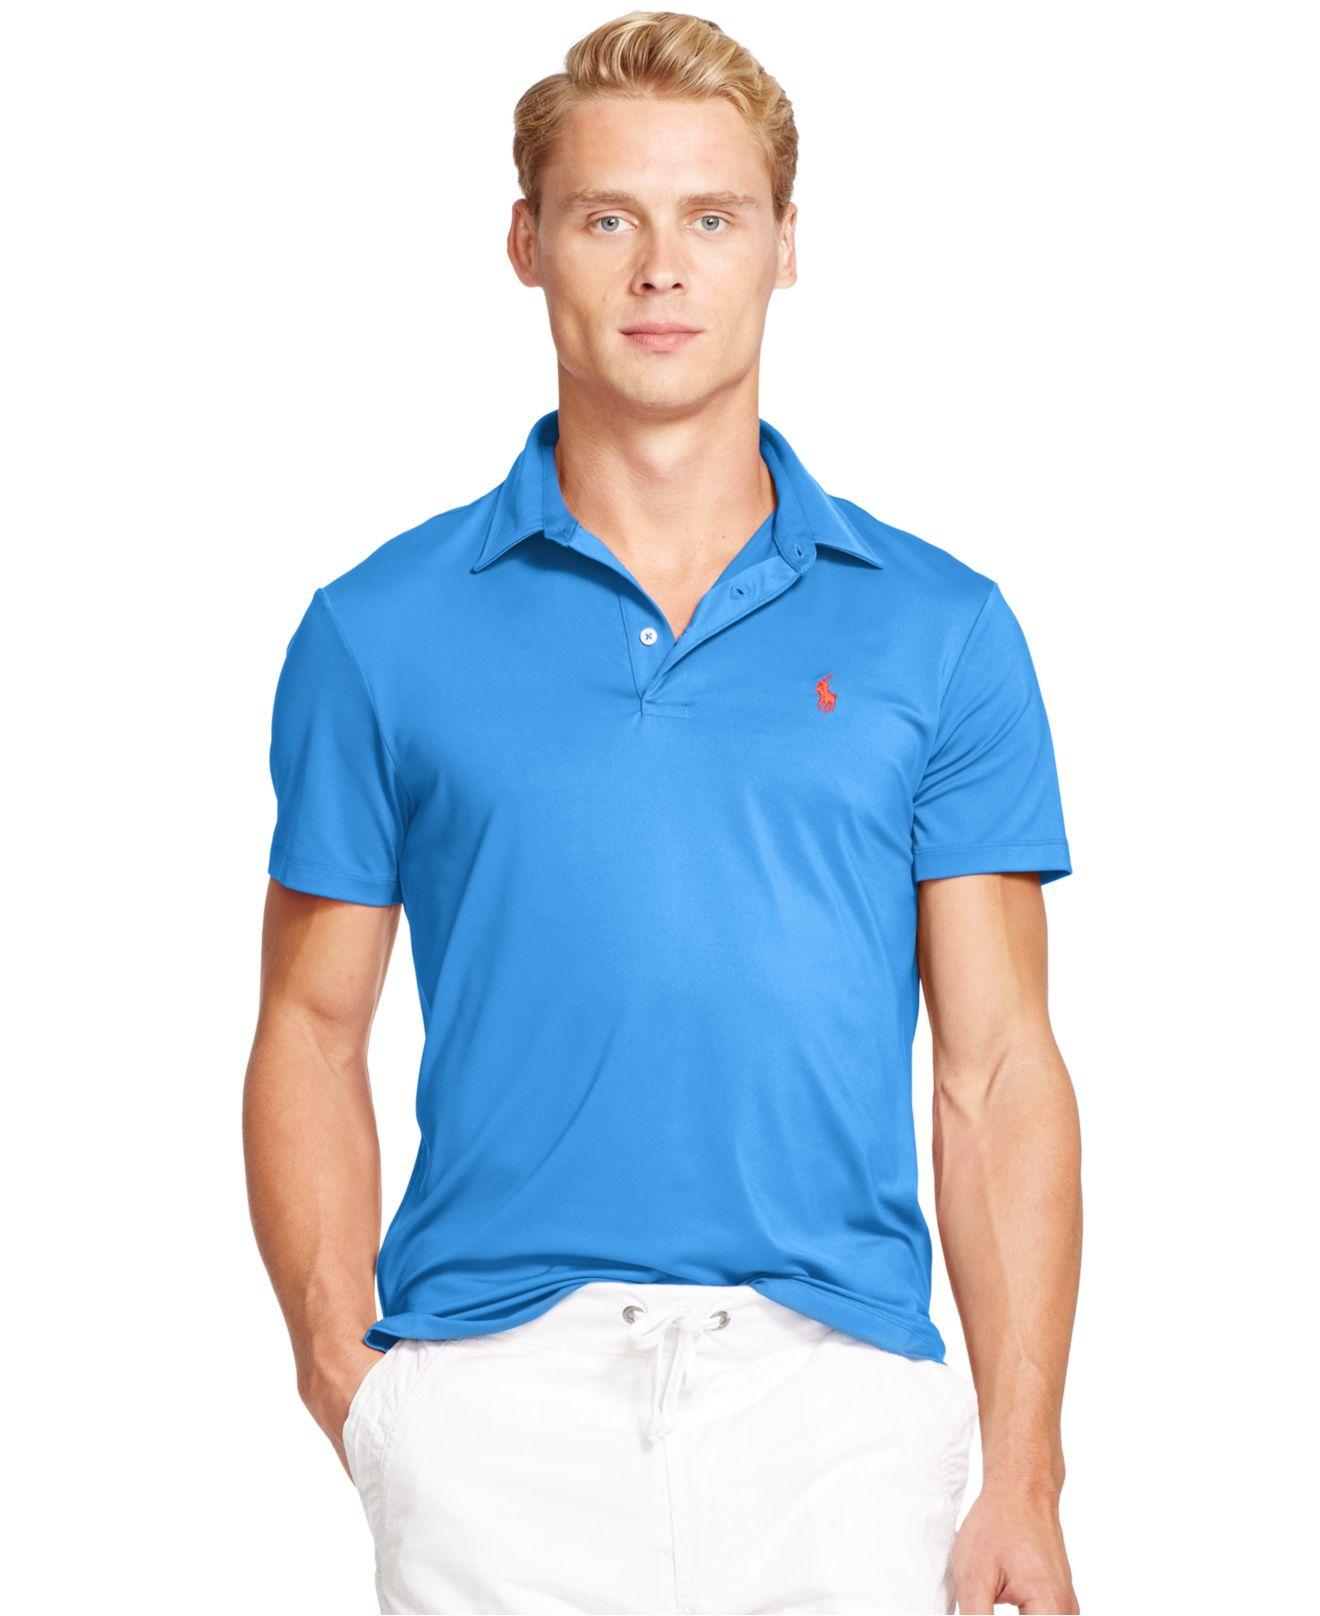 Ralph Blue Performance For Lisle Polo Lauren Men Shirt 0POkZnXNw8